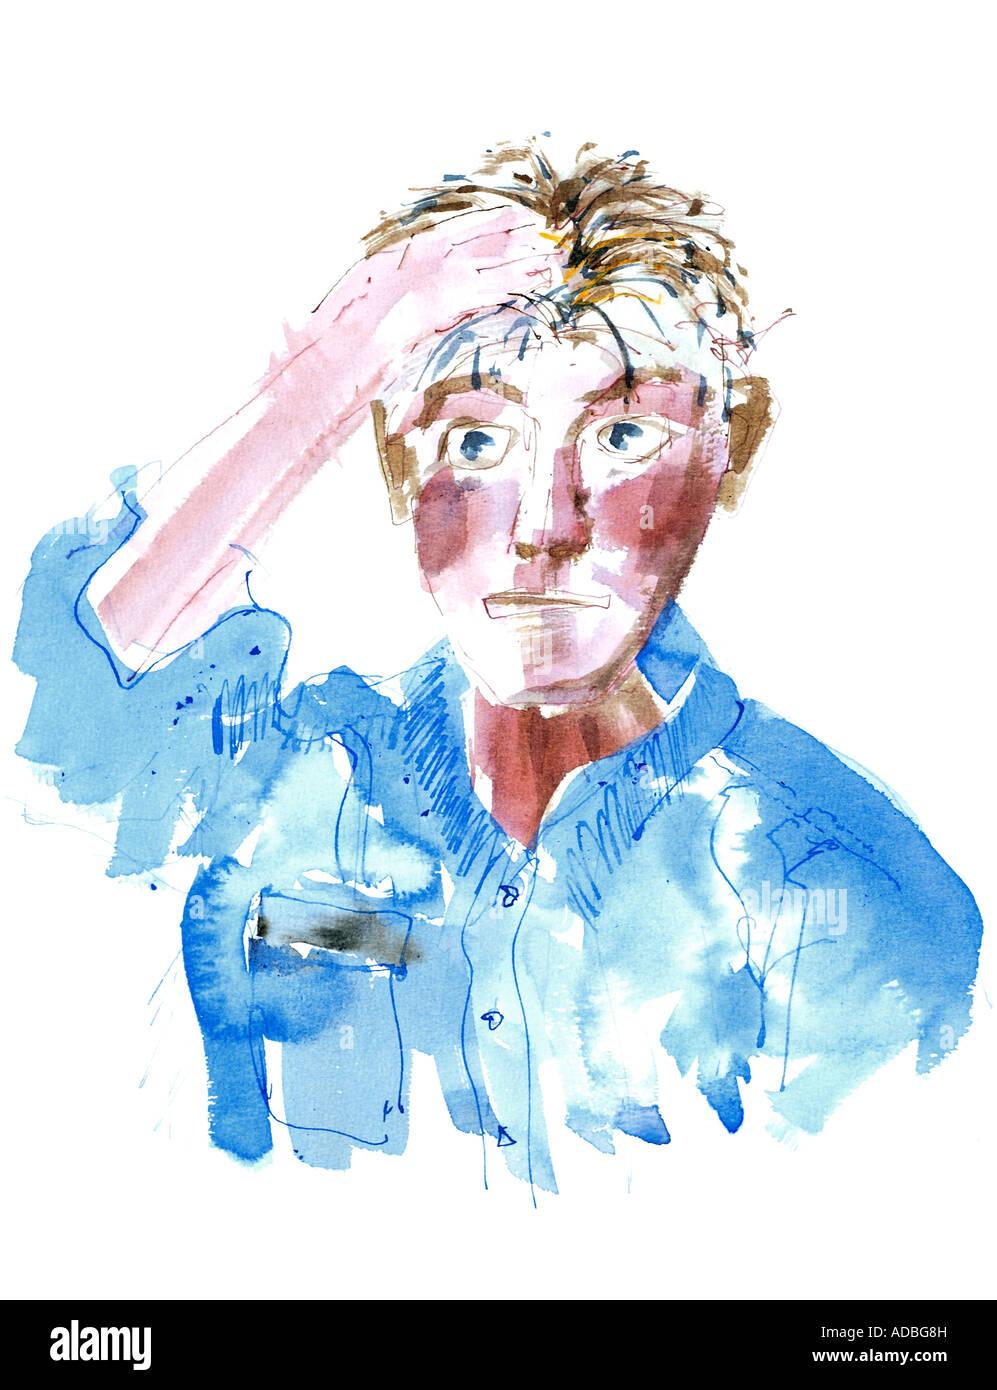 Self-portrait pen and wash drawing - Ed Buziak. Stock Photo